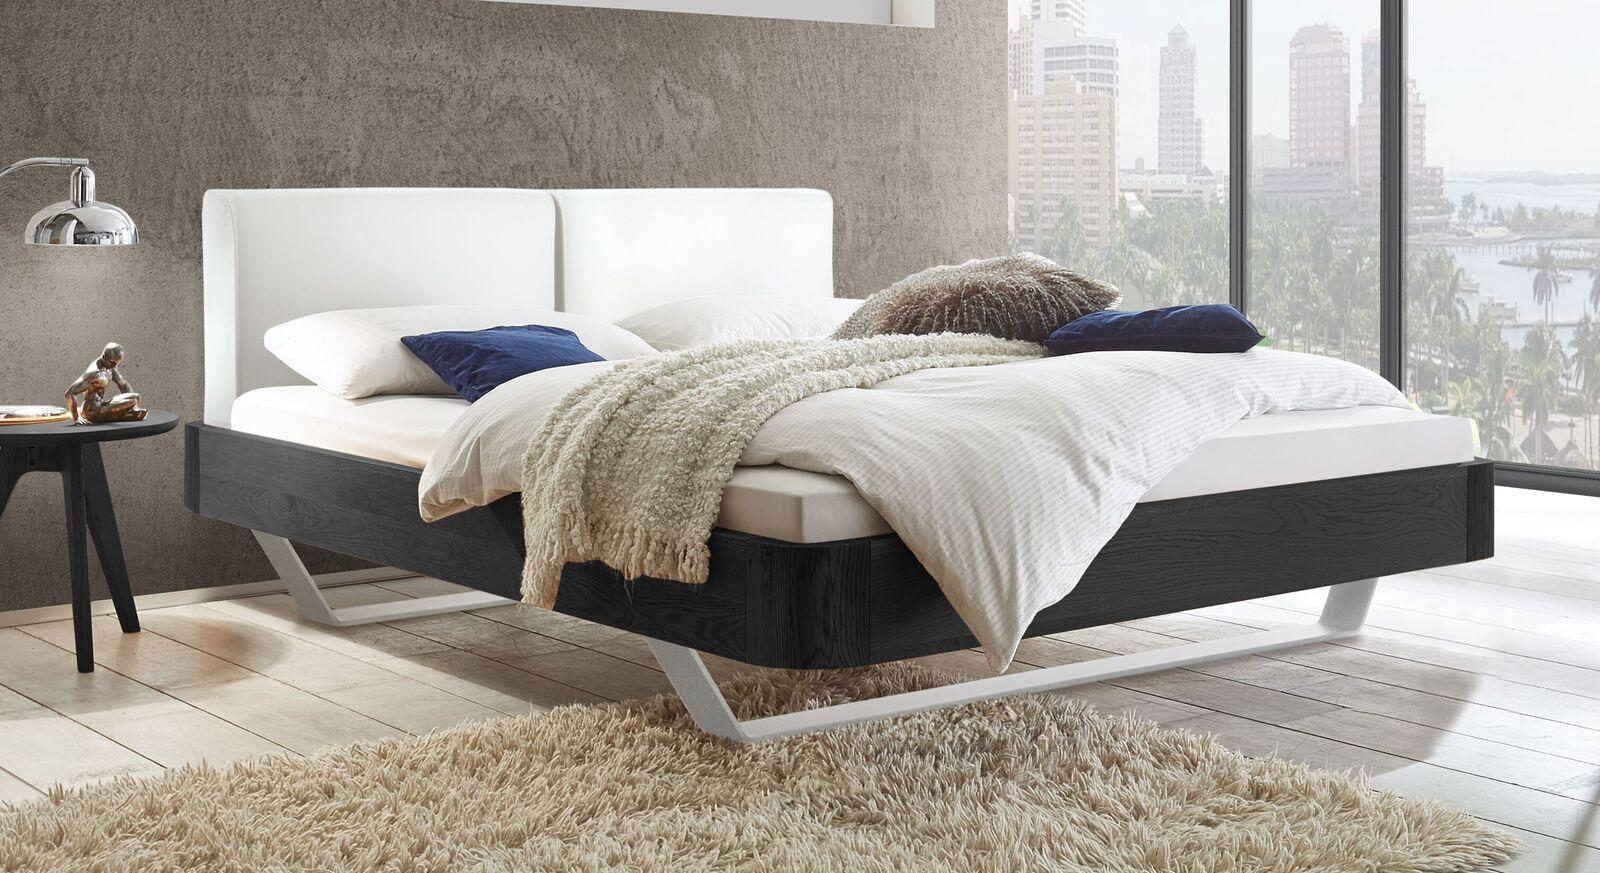 Bett Poncas aus graphitfarbenem Eichenholz